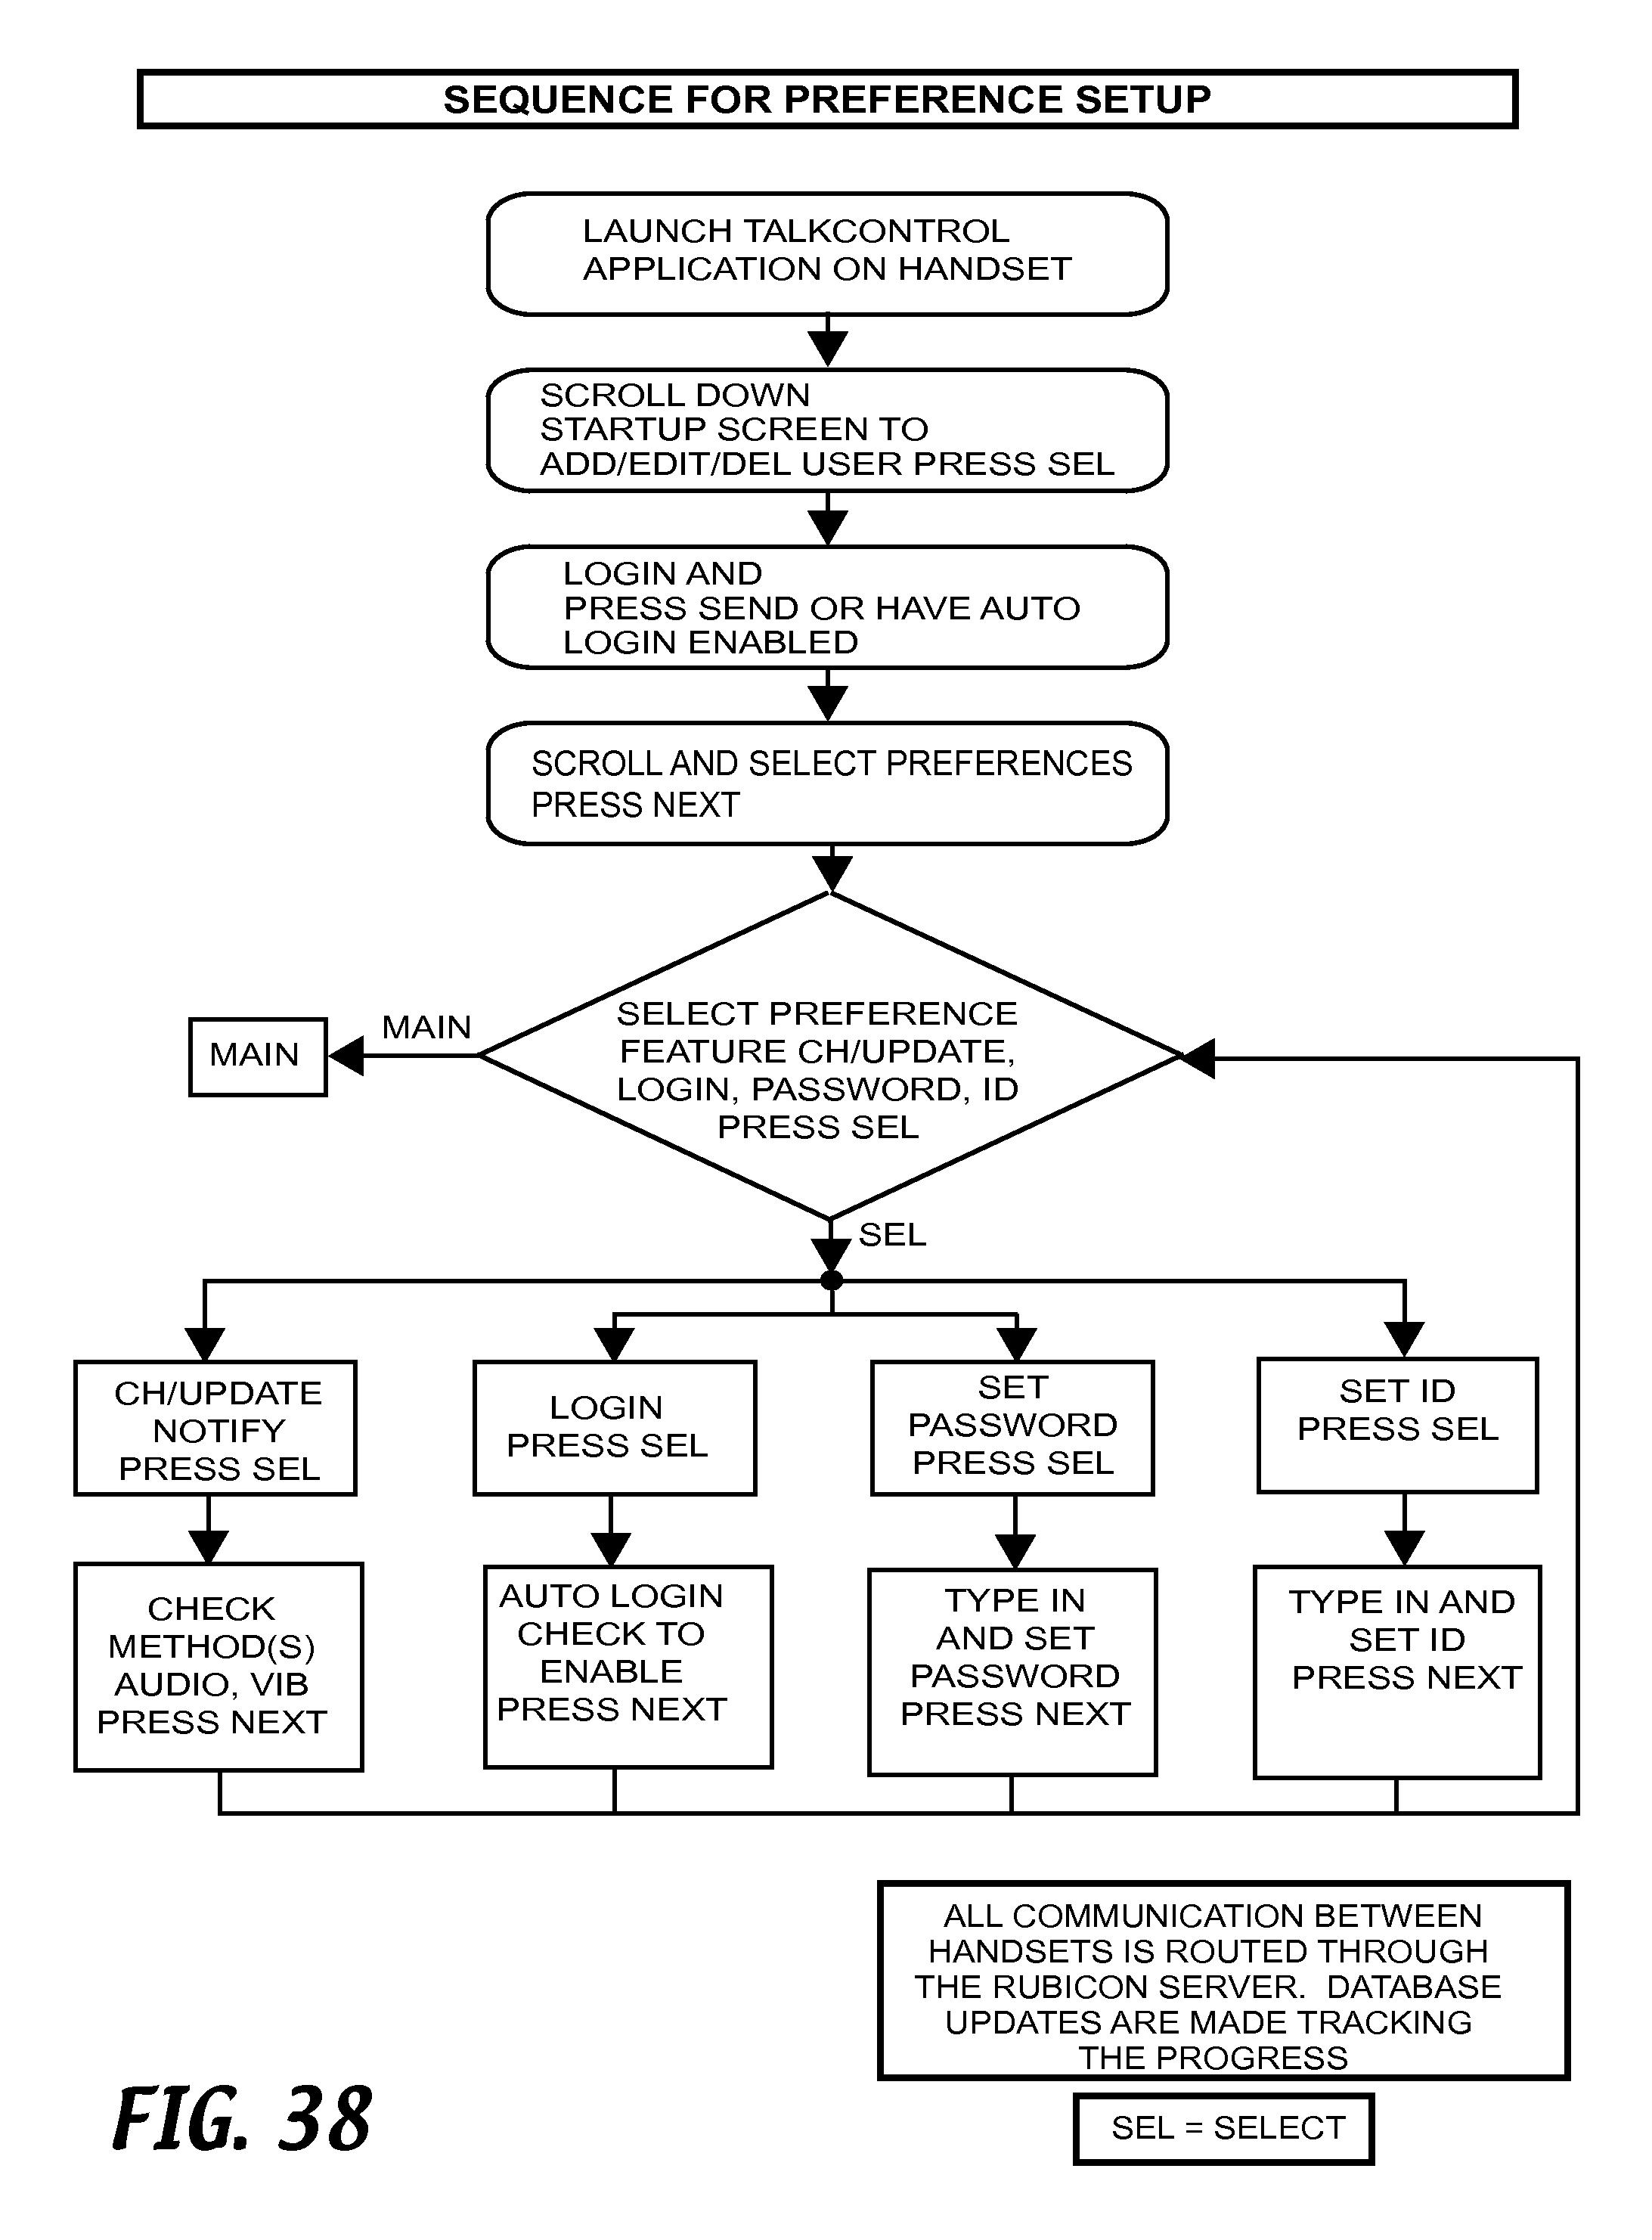 Patent US 8,831,635 B2